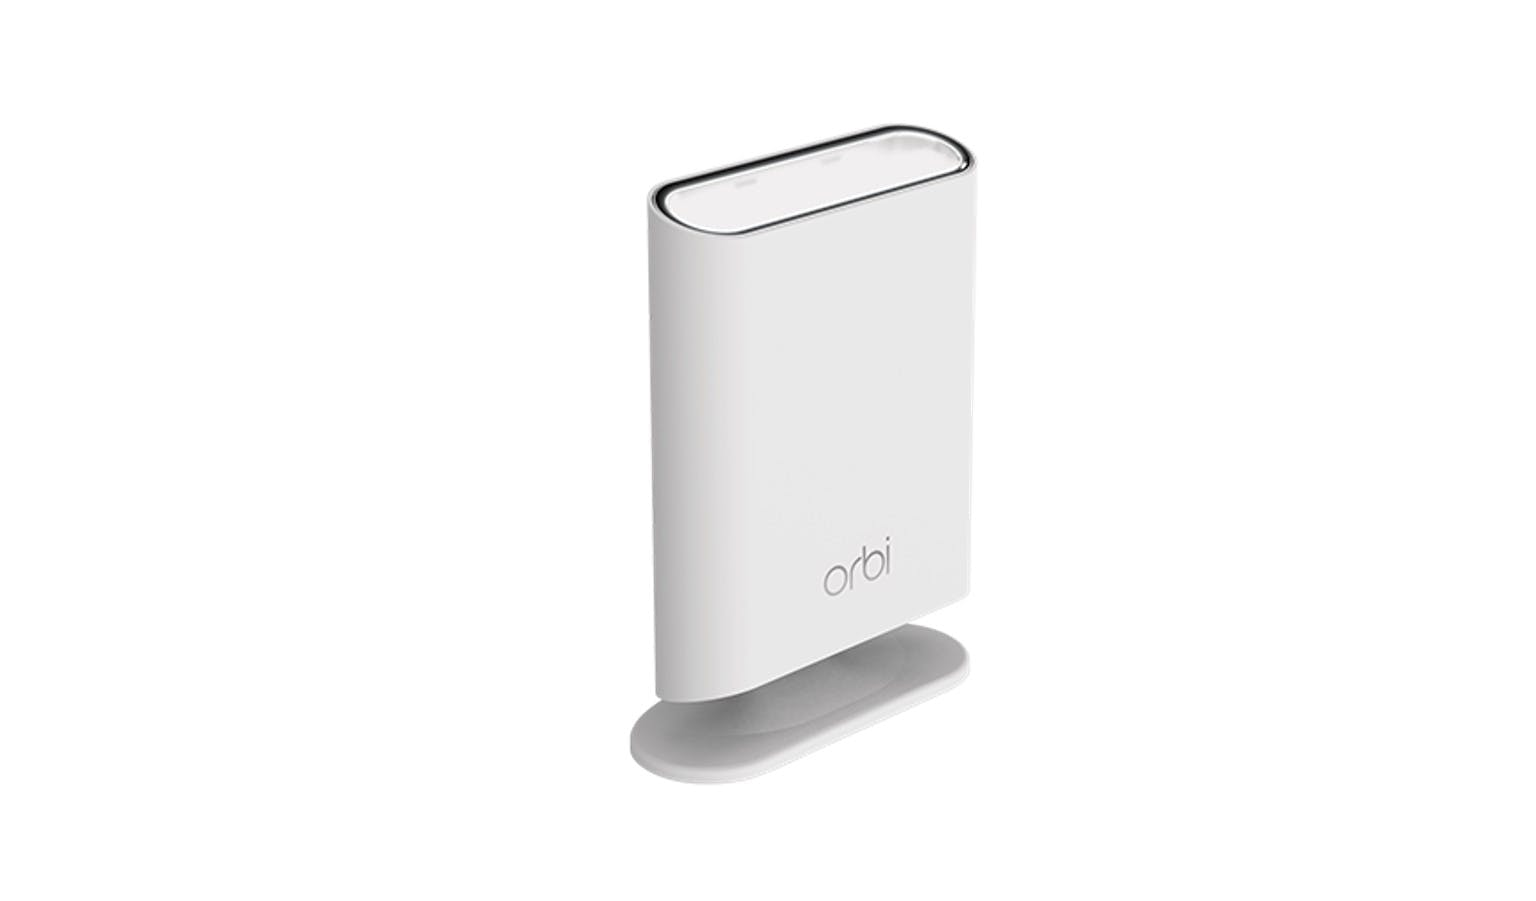 Netgear Add-on Orbi Outdoor Satellite - White